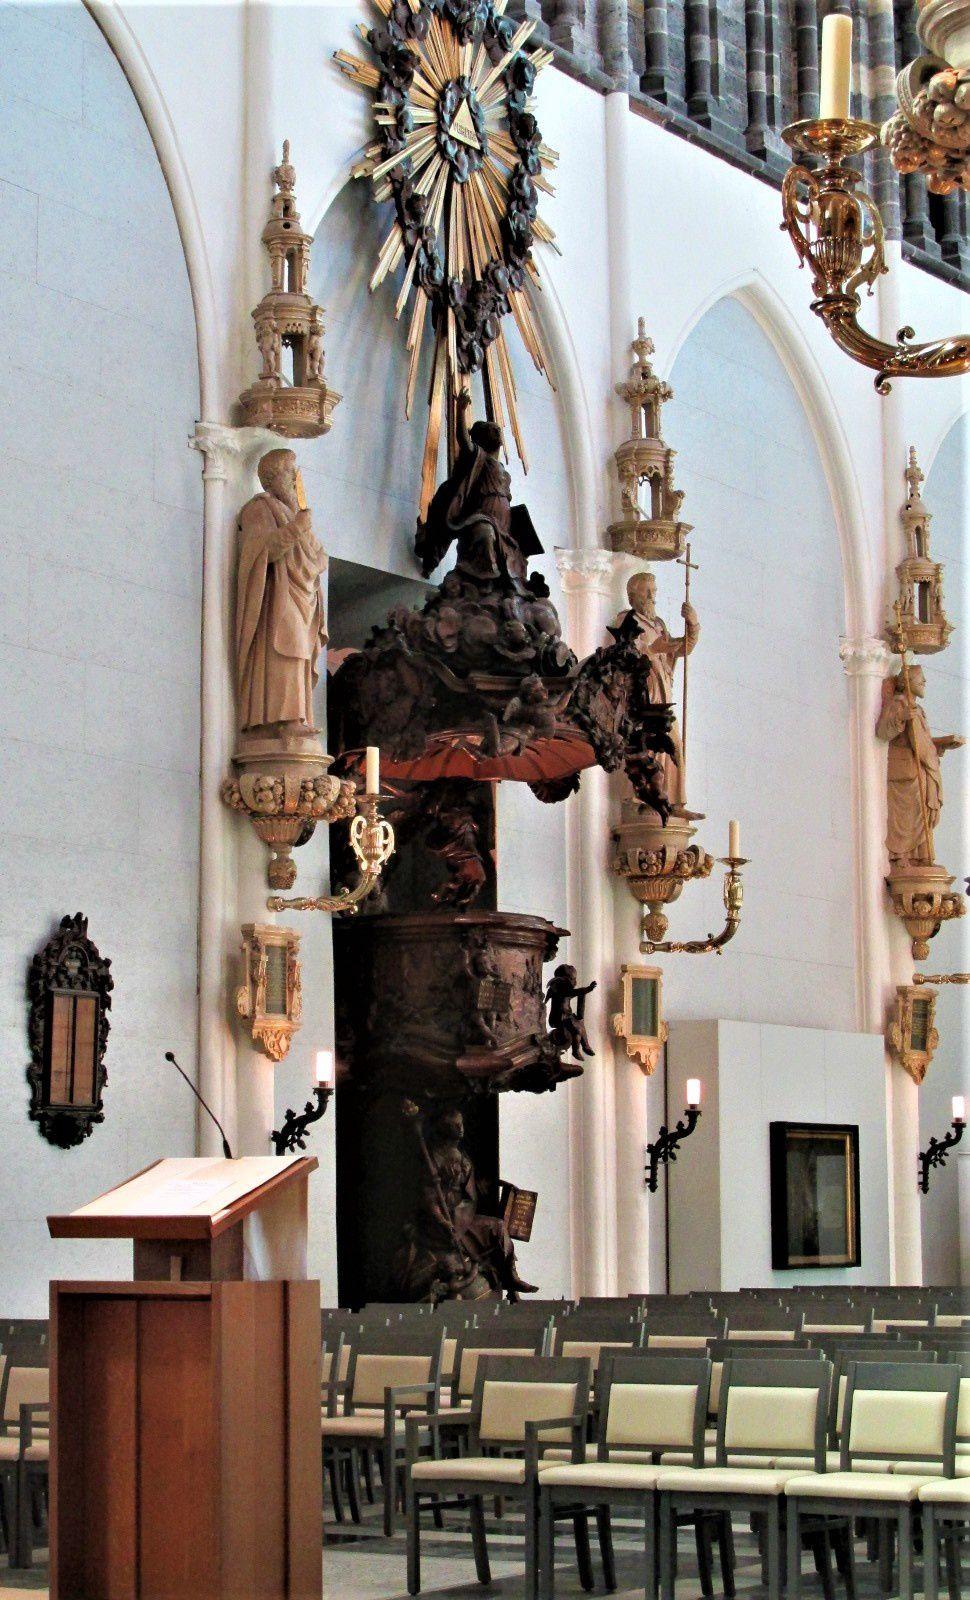 ~ Eglise Notre Dame de Bruges ~